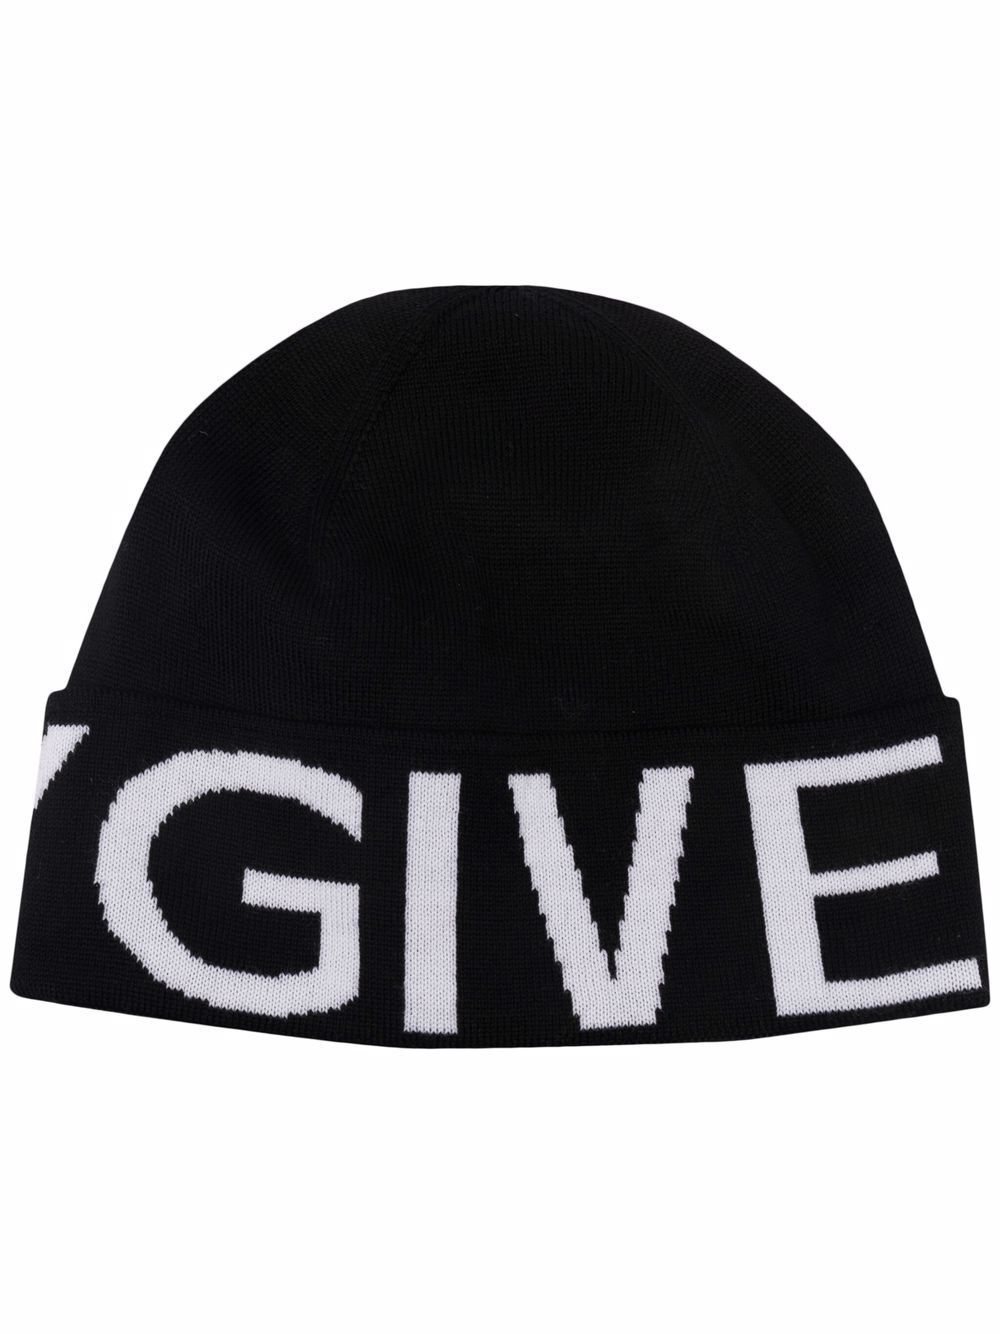 Givenchy cappelli nero